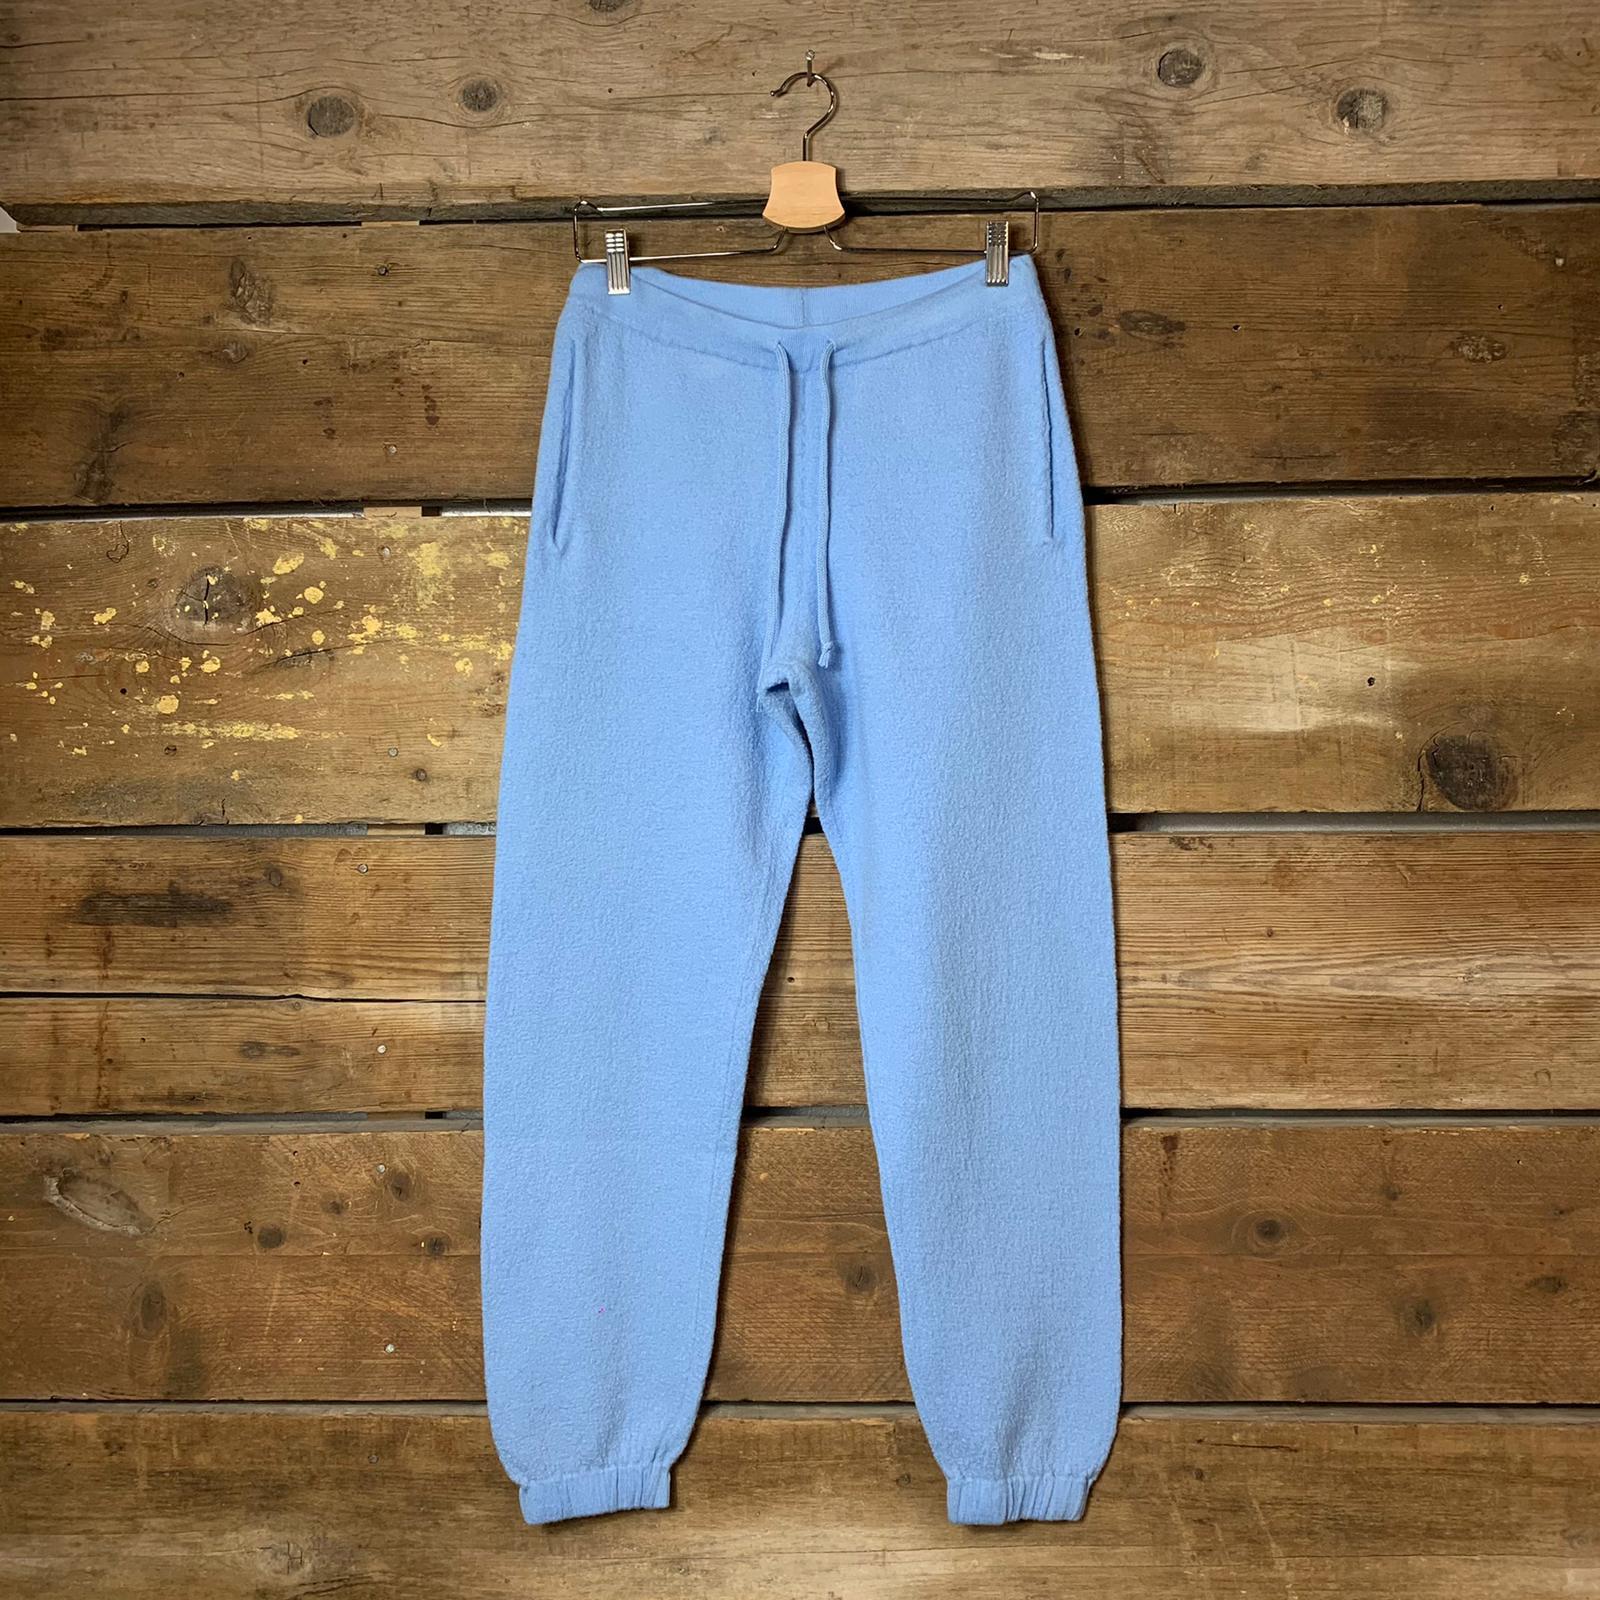 Pantalone American Vintage Jogger TadBow Ceruleo